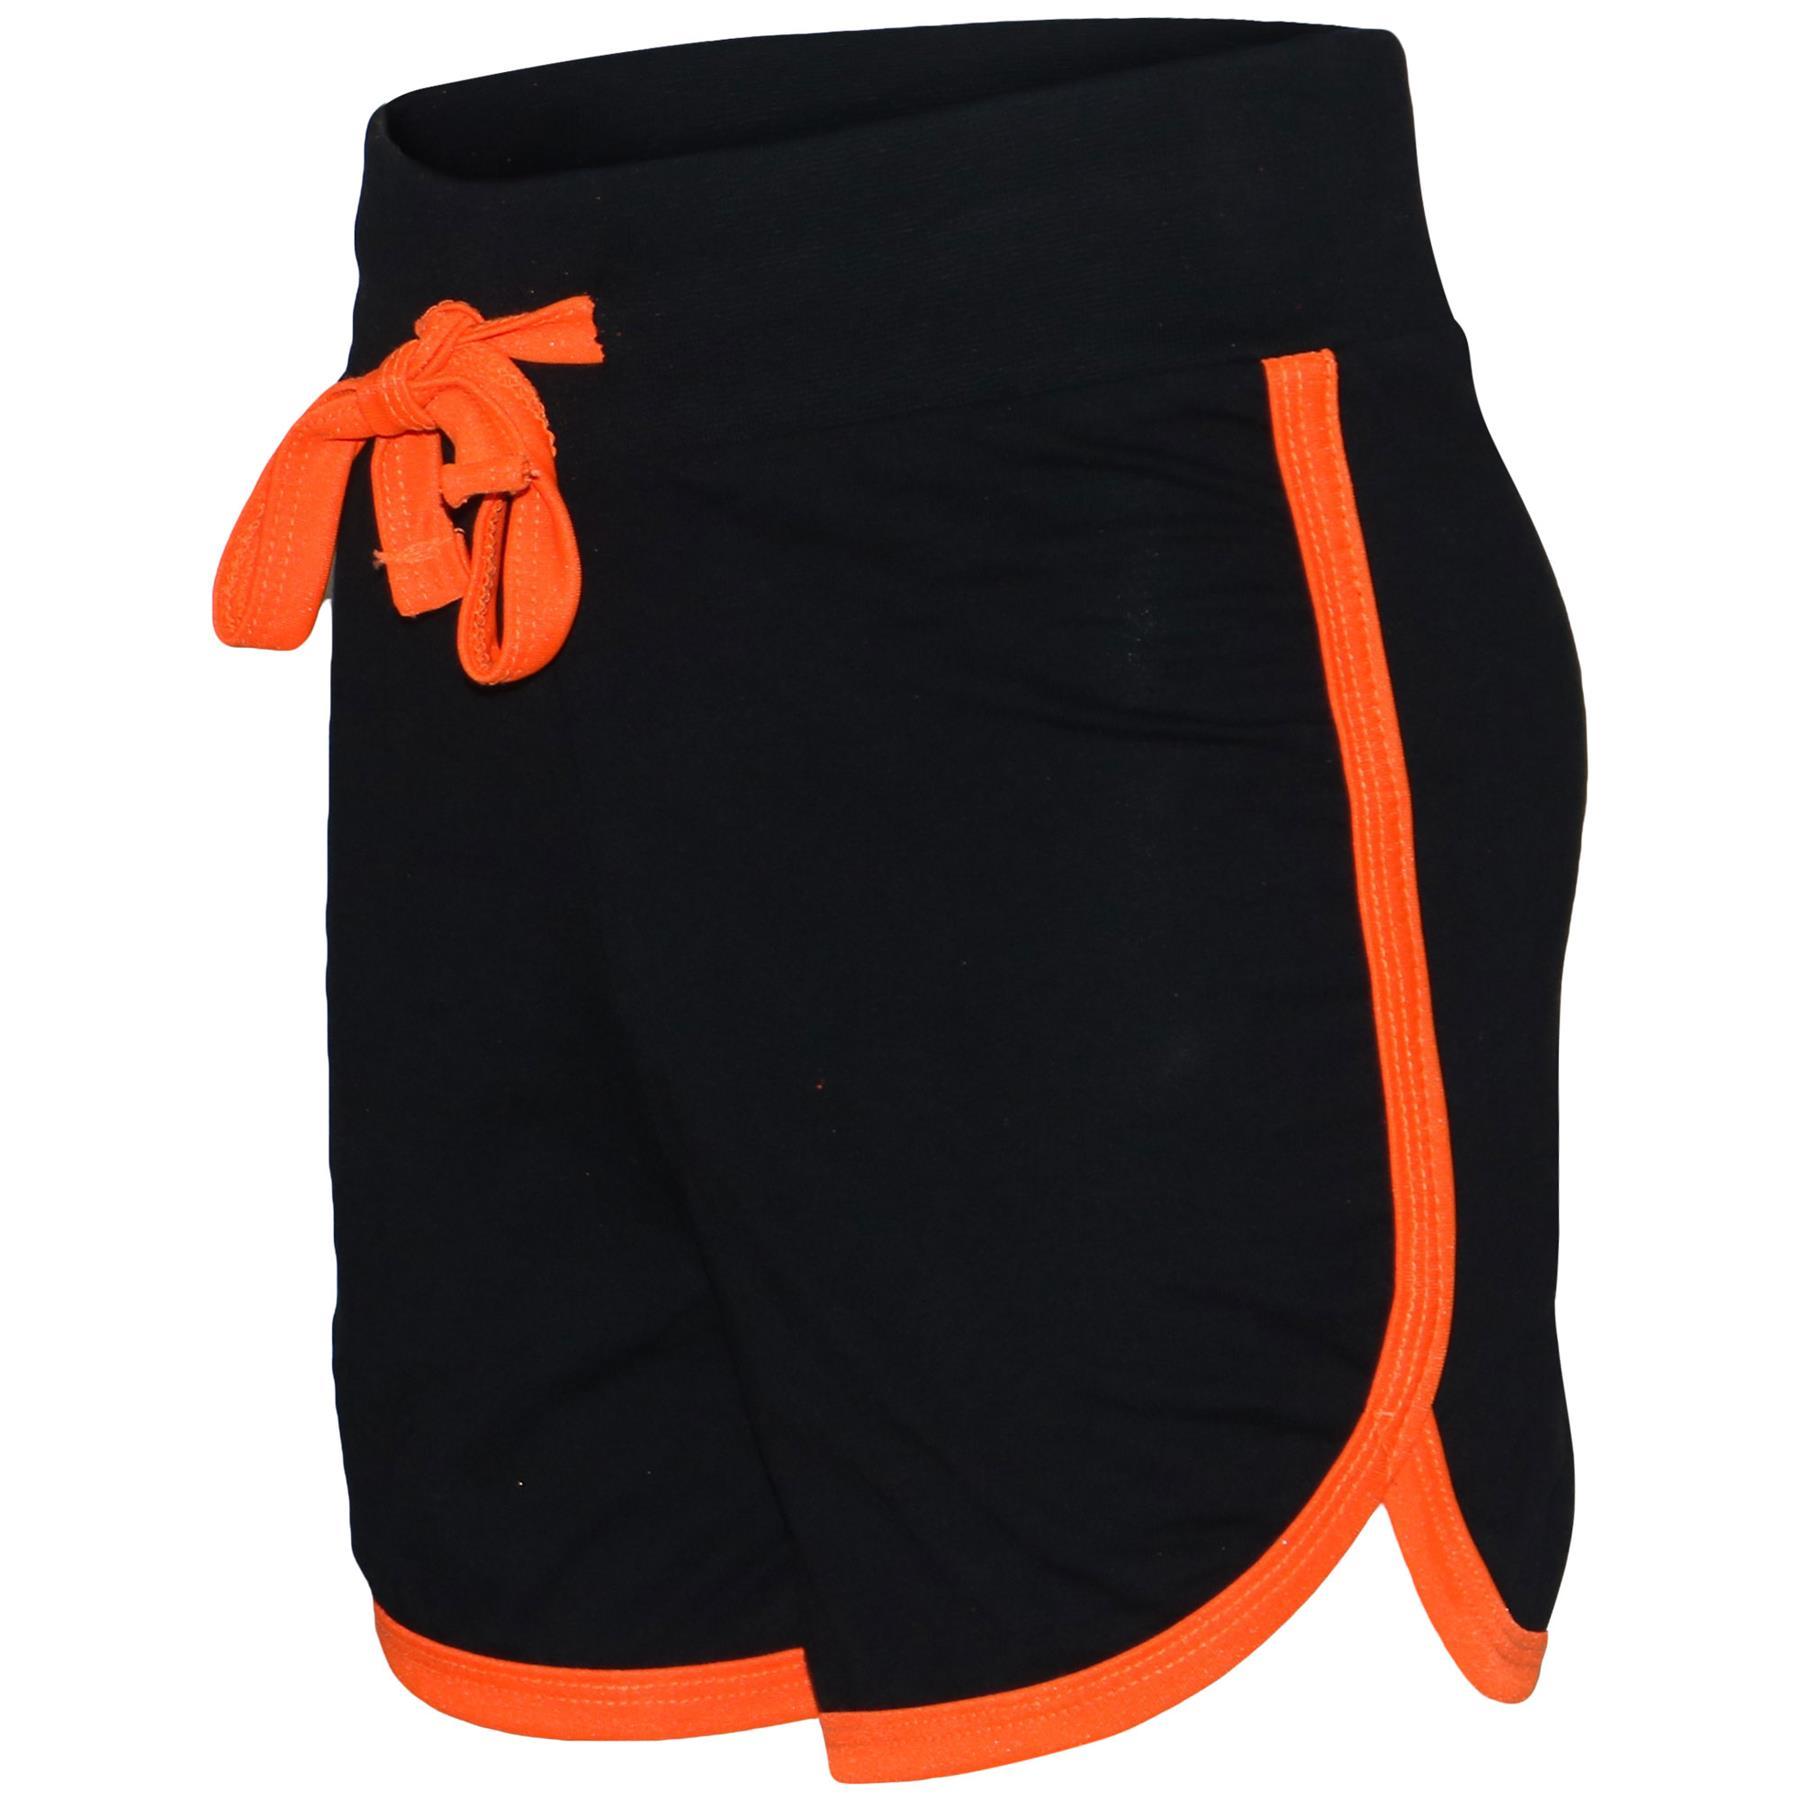 Kids-Girls-Shorts-100-Cotton-Dance-Gym-Sports-Summer-Hot-Short-Pants-2-13-Years Indexbild 10